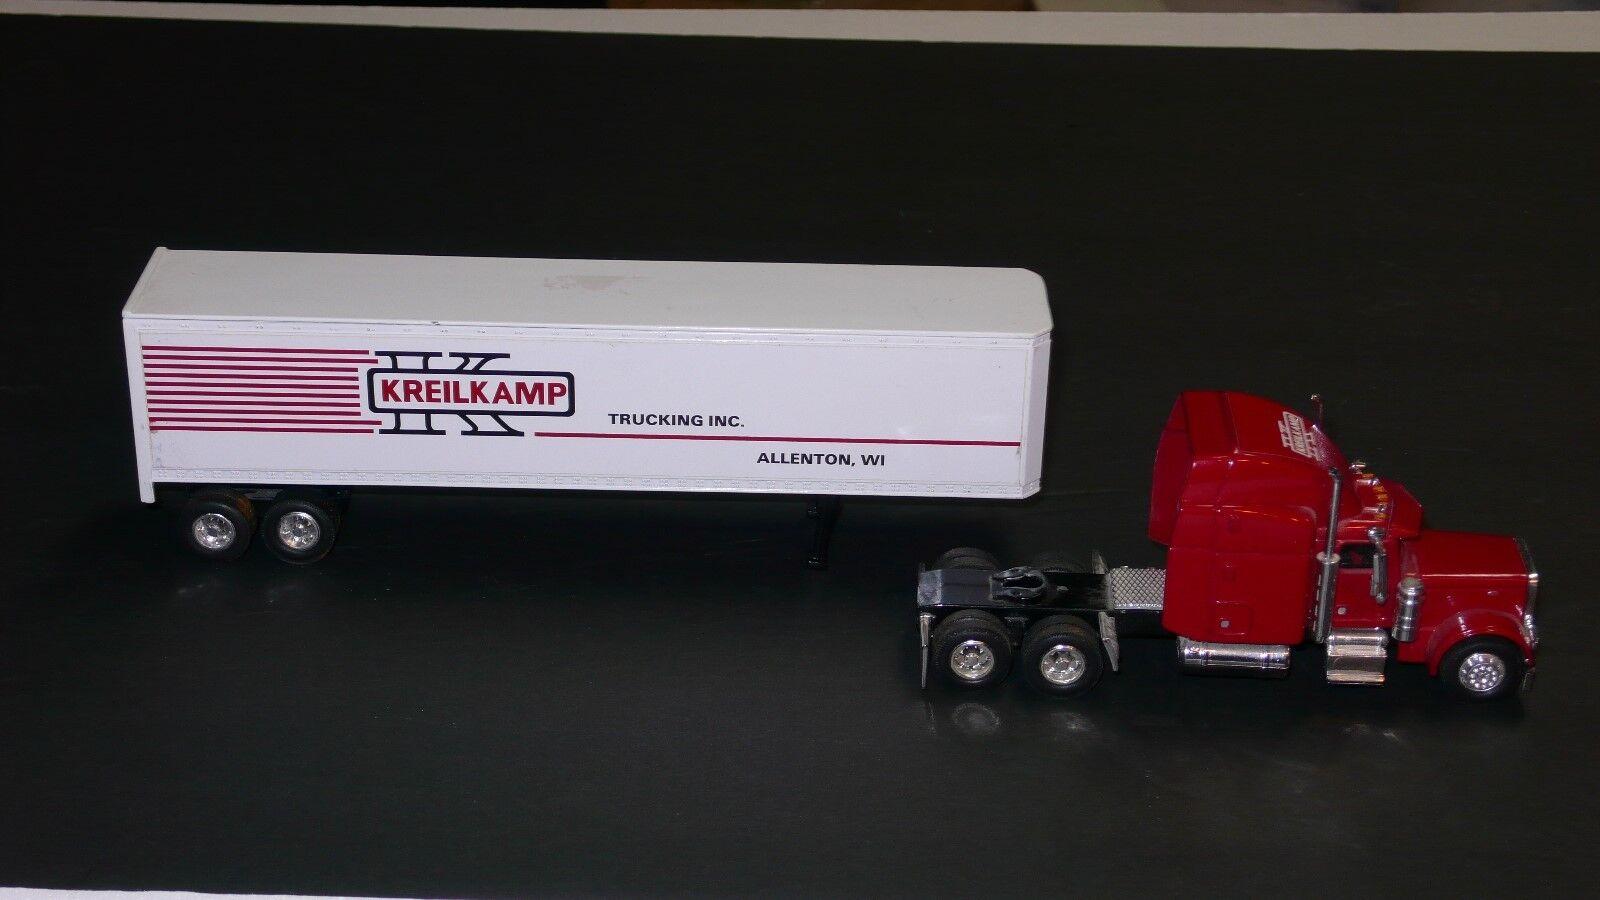 Peterbilt 379 Kreilkamp camiones Allenton Wi Semi Camión Remolque 1 64 Liberty